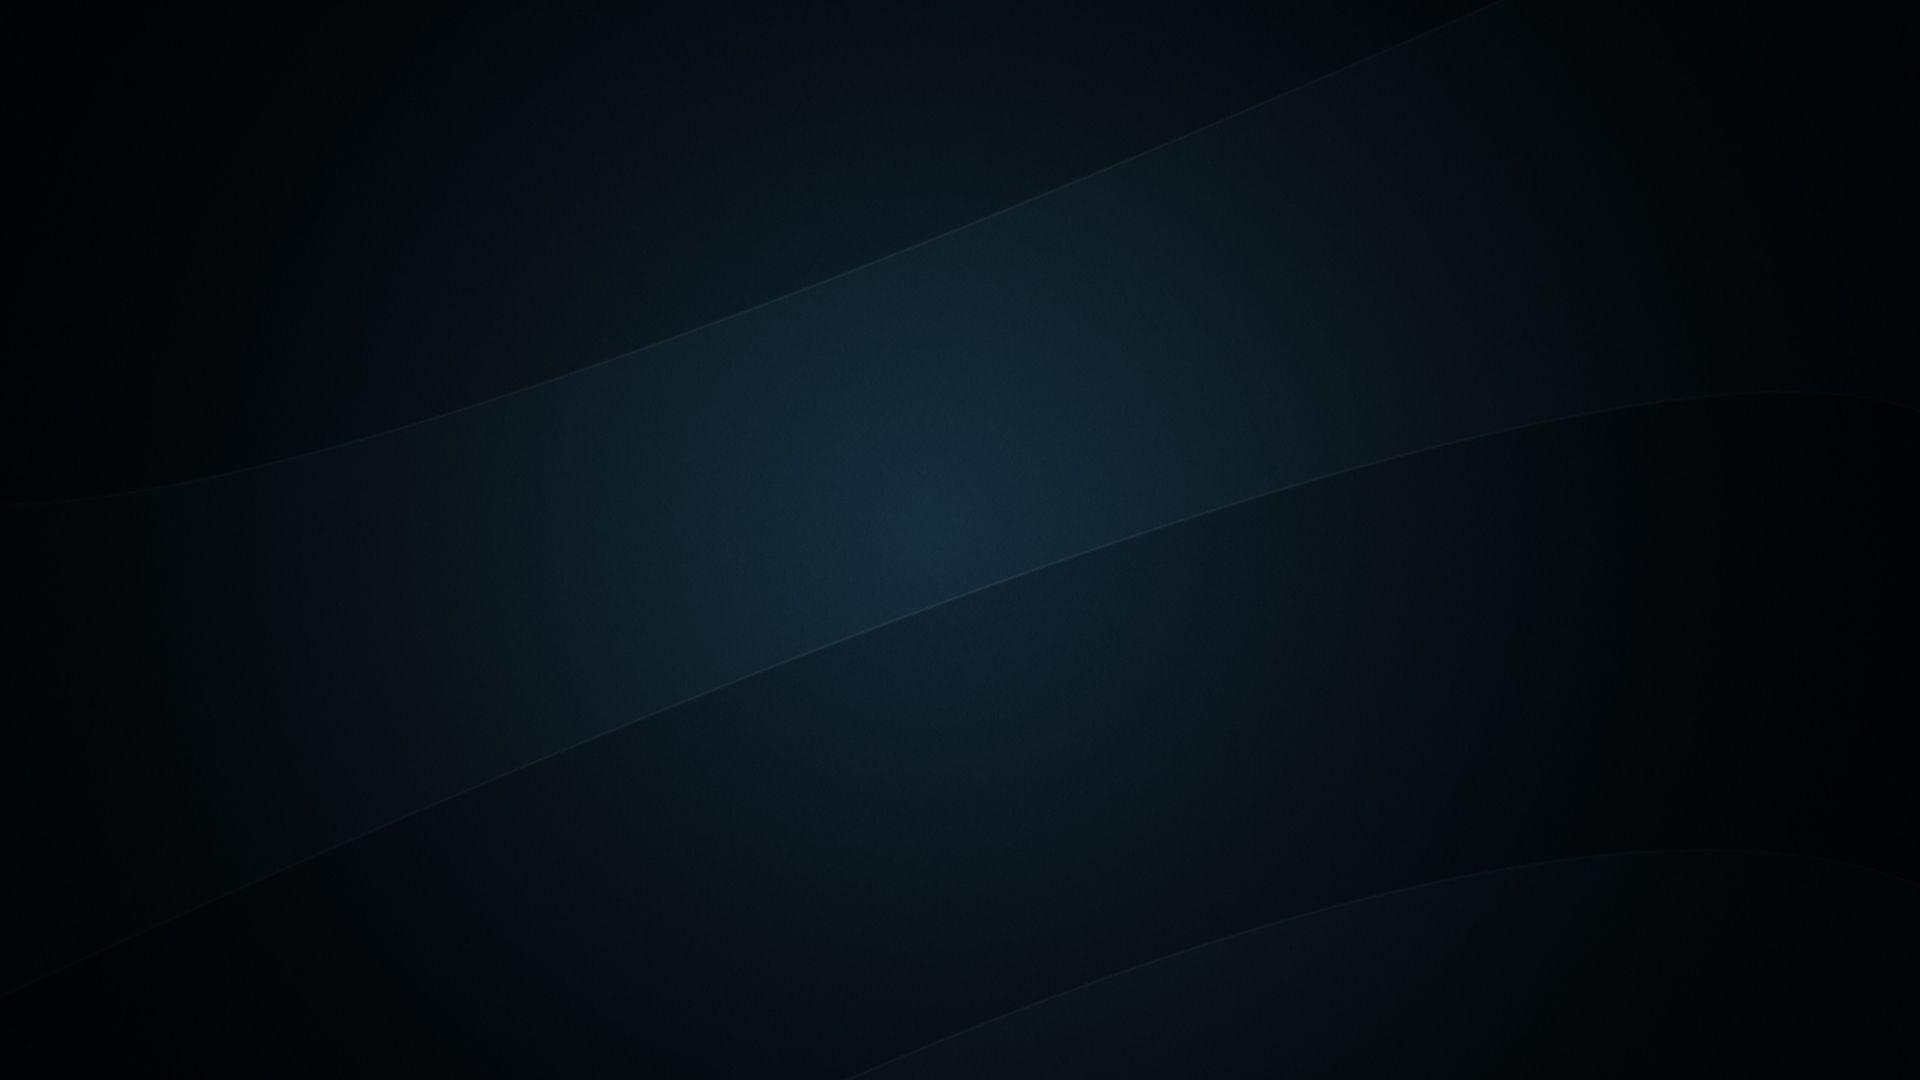 Dark Blue Wallpapers 1920x1080 Wallpaper Cave